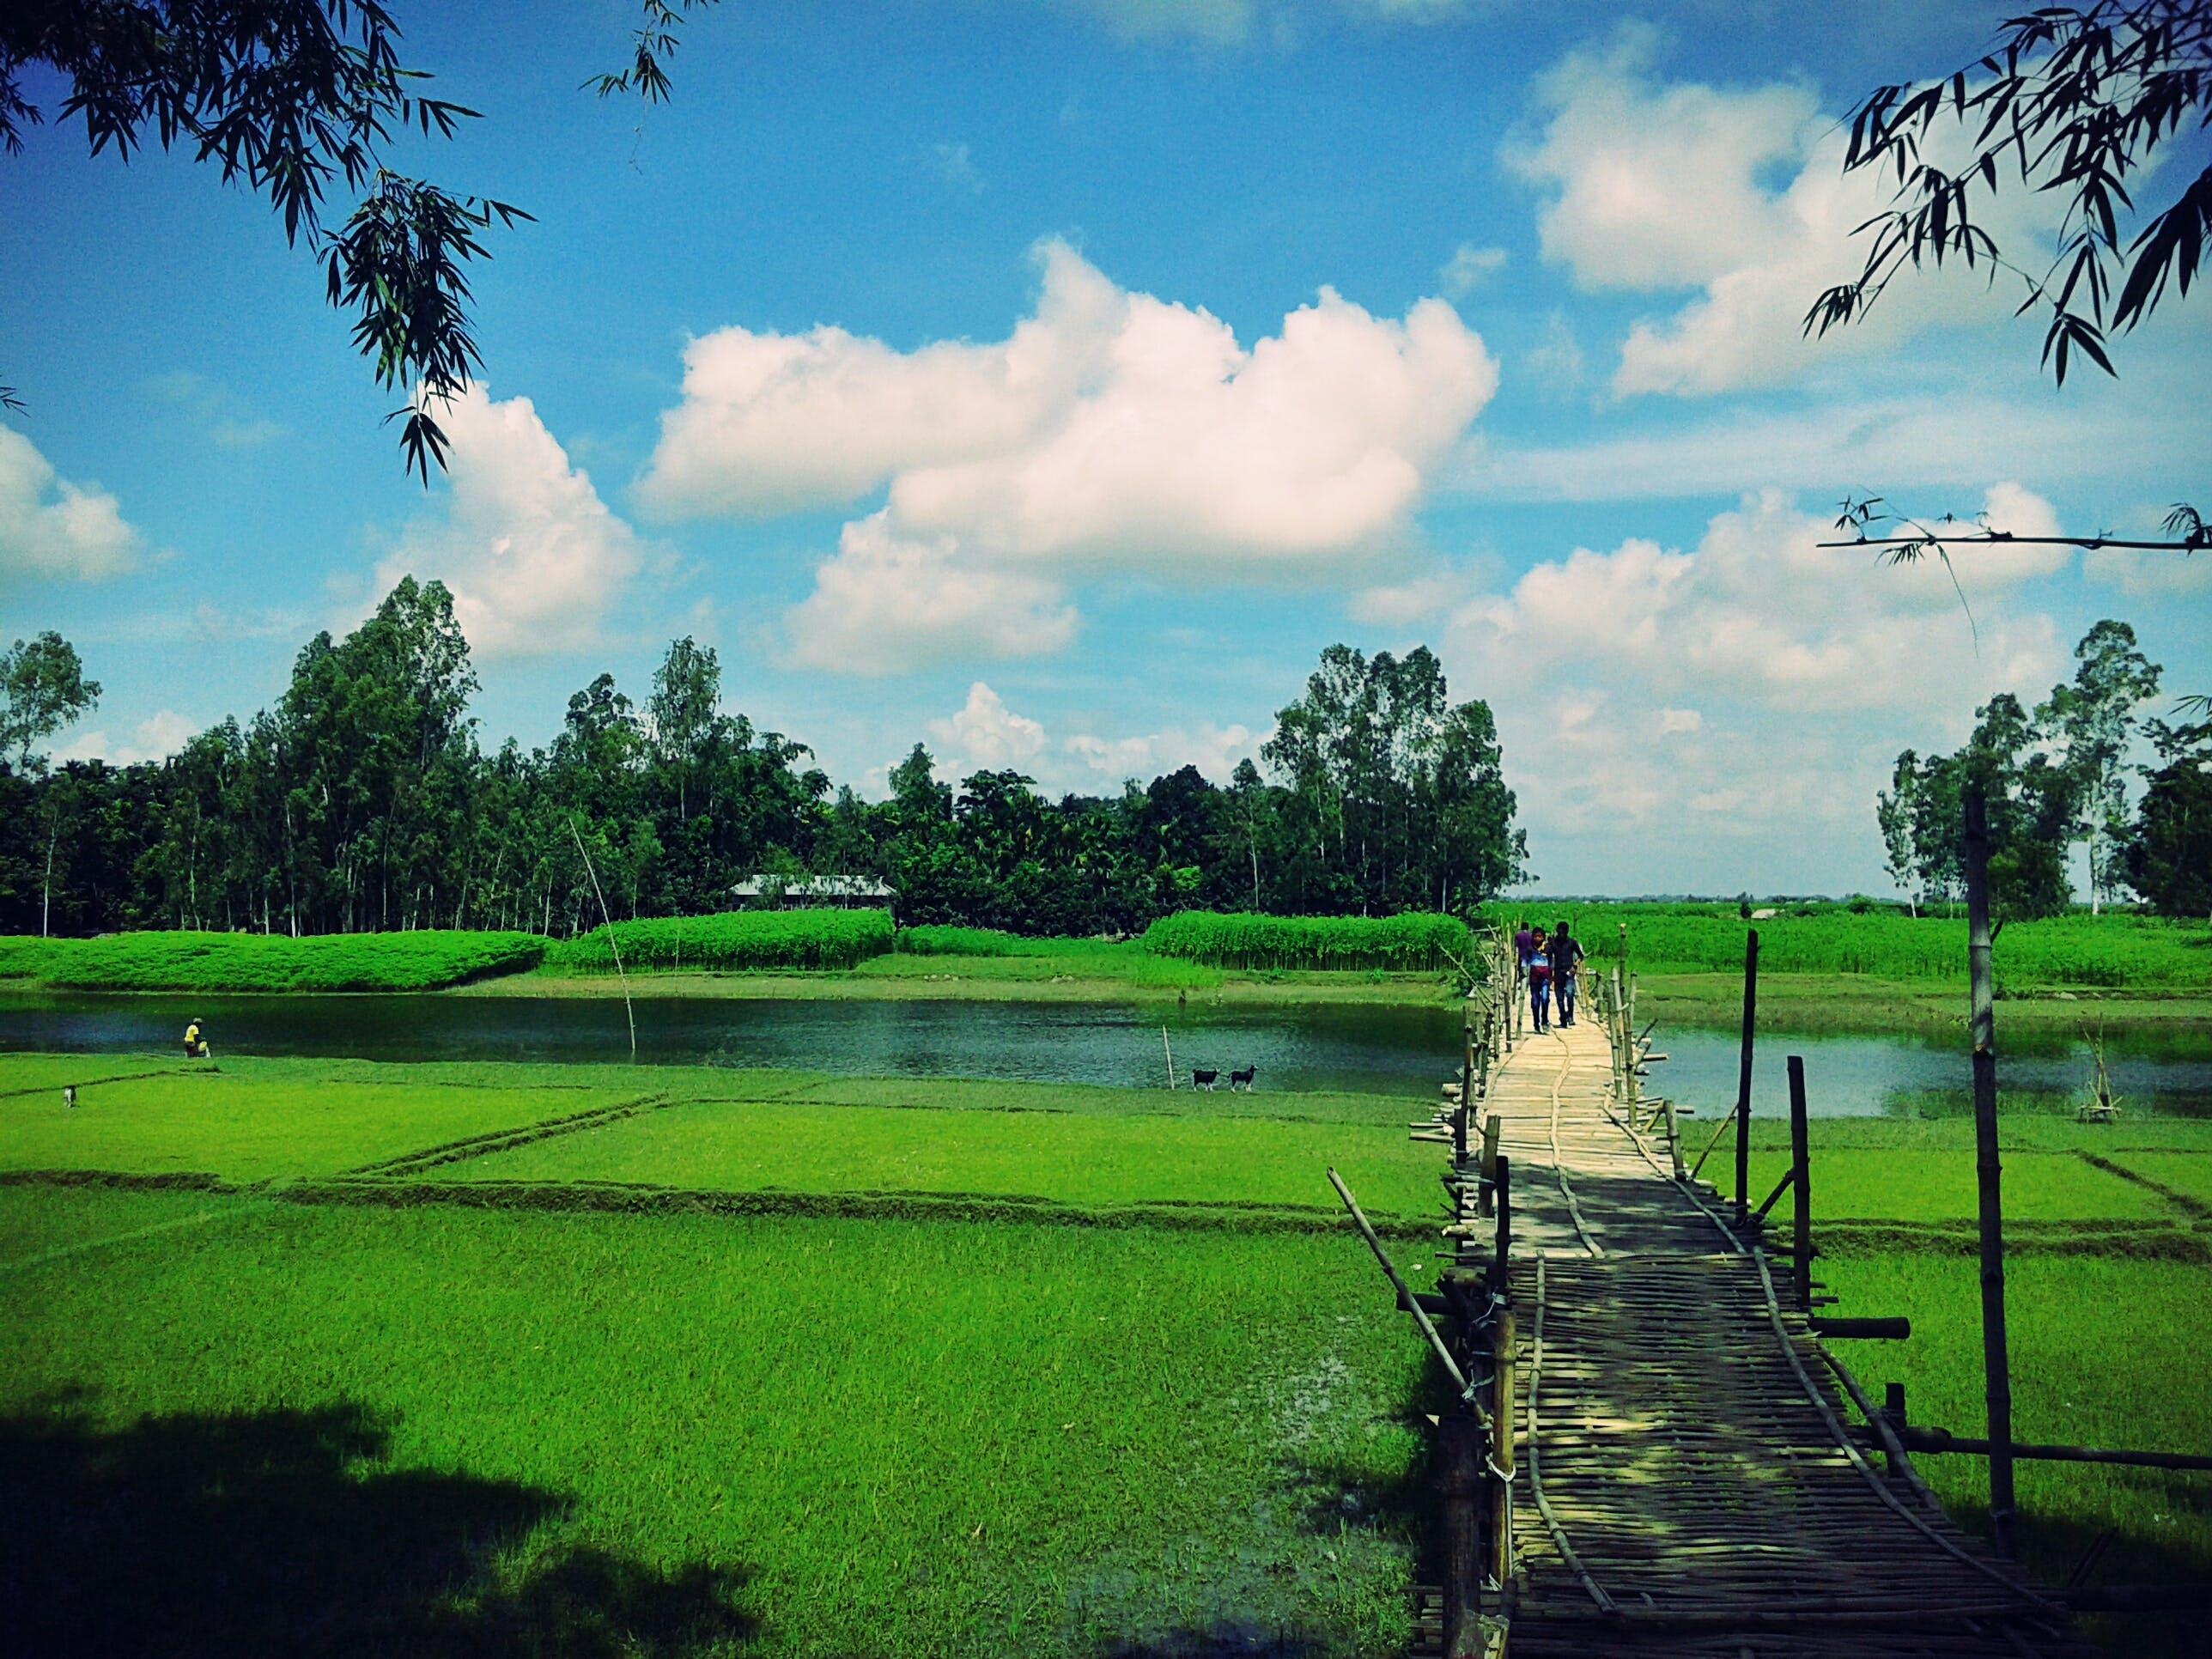 Scenic View of the Farm